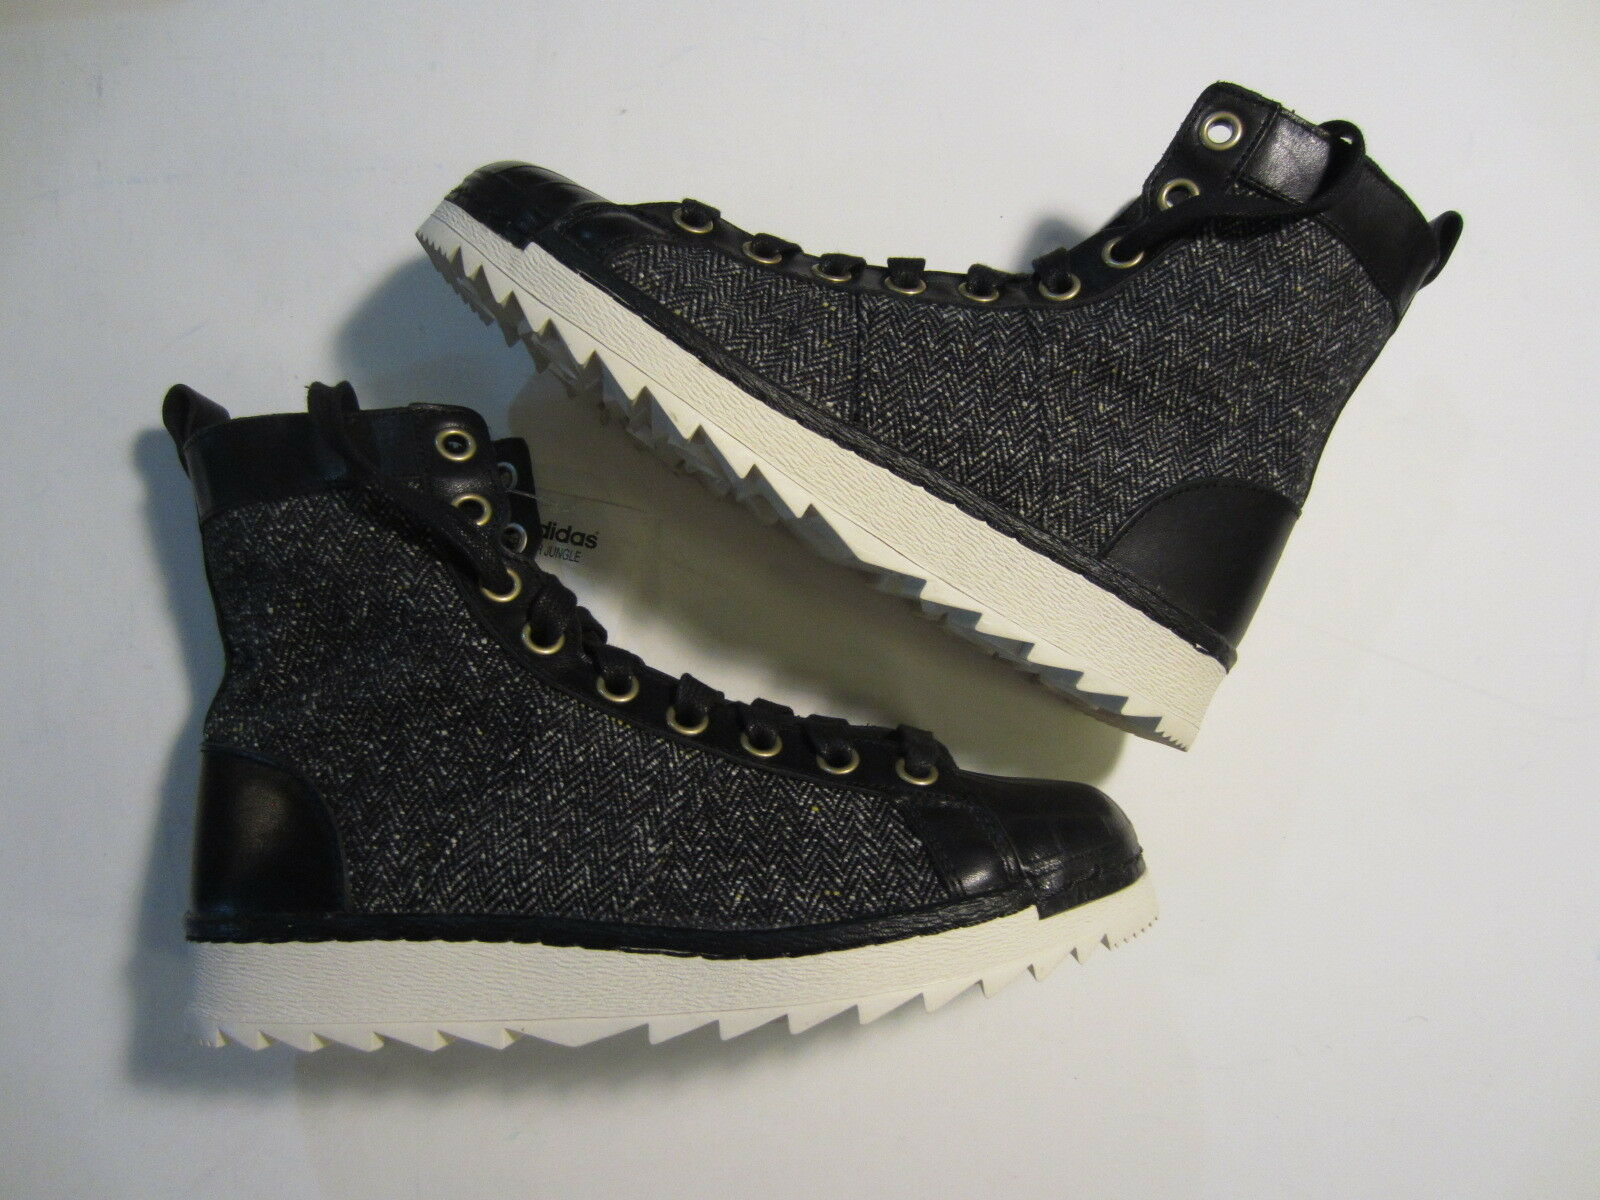 NEW Adidas Superstar Jungle Originals mens high boot shoe B35229 black 7 - 11.5